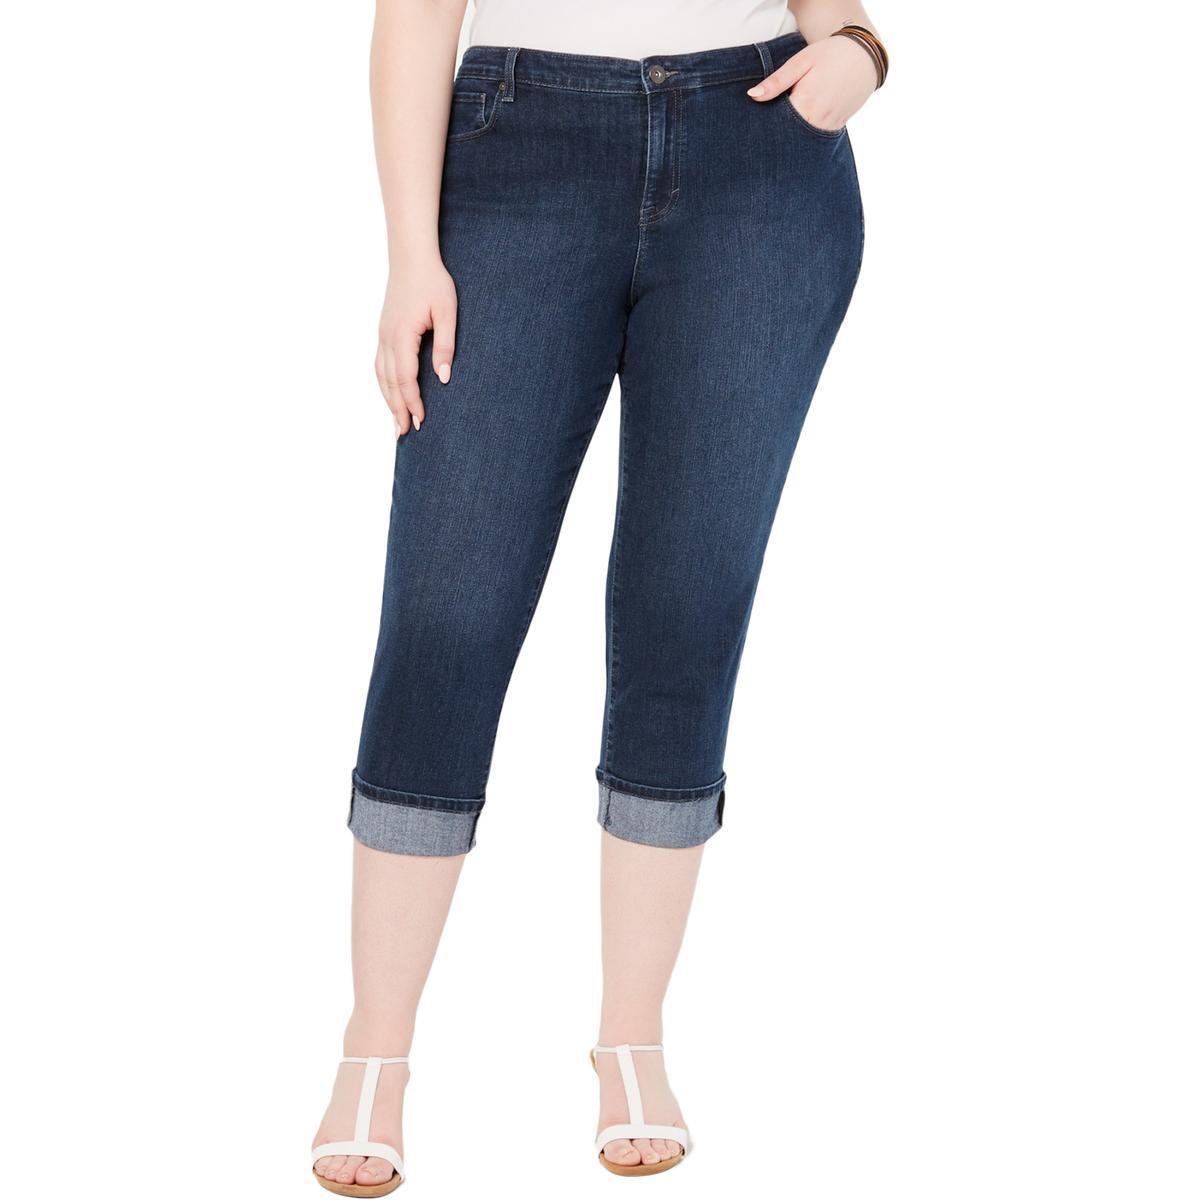 Style & Co. Womens Denim Mid Rise Capri Jeans Plus BHFO 5499